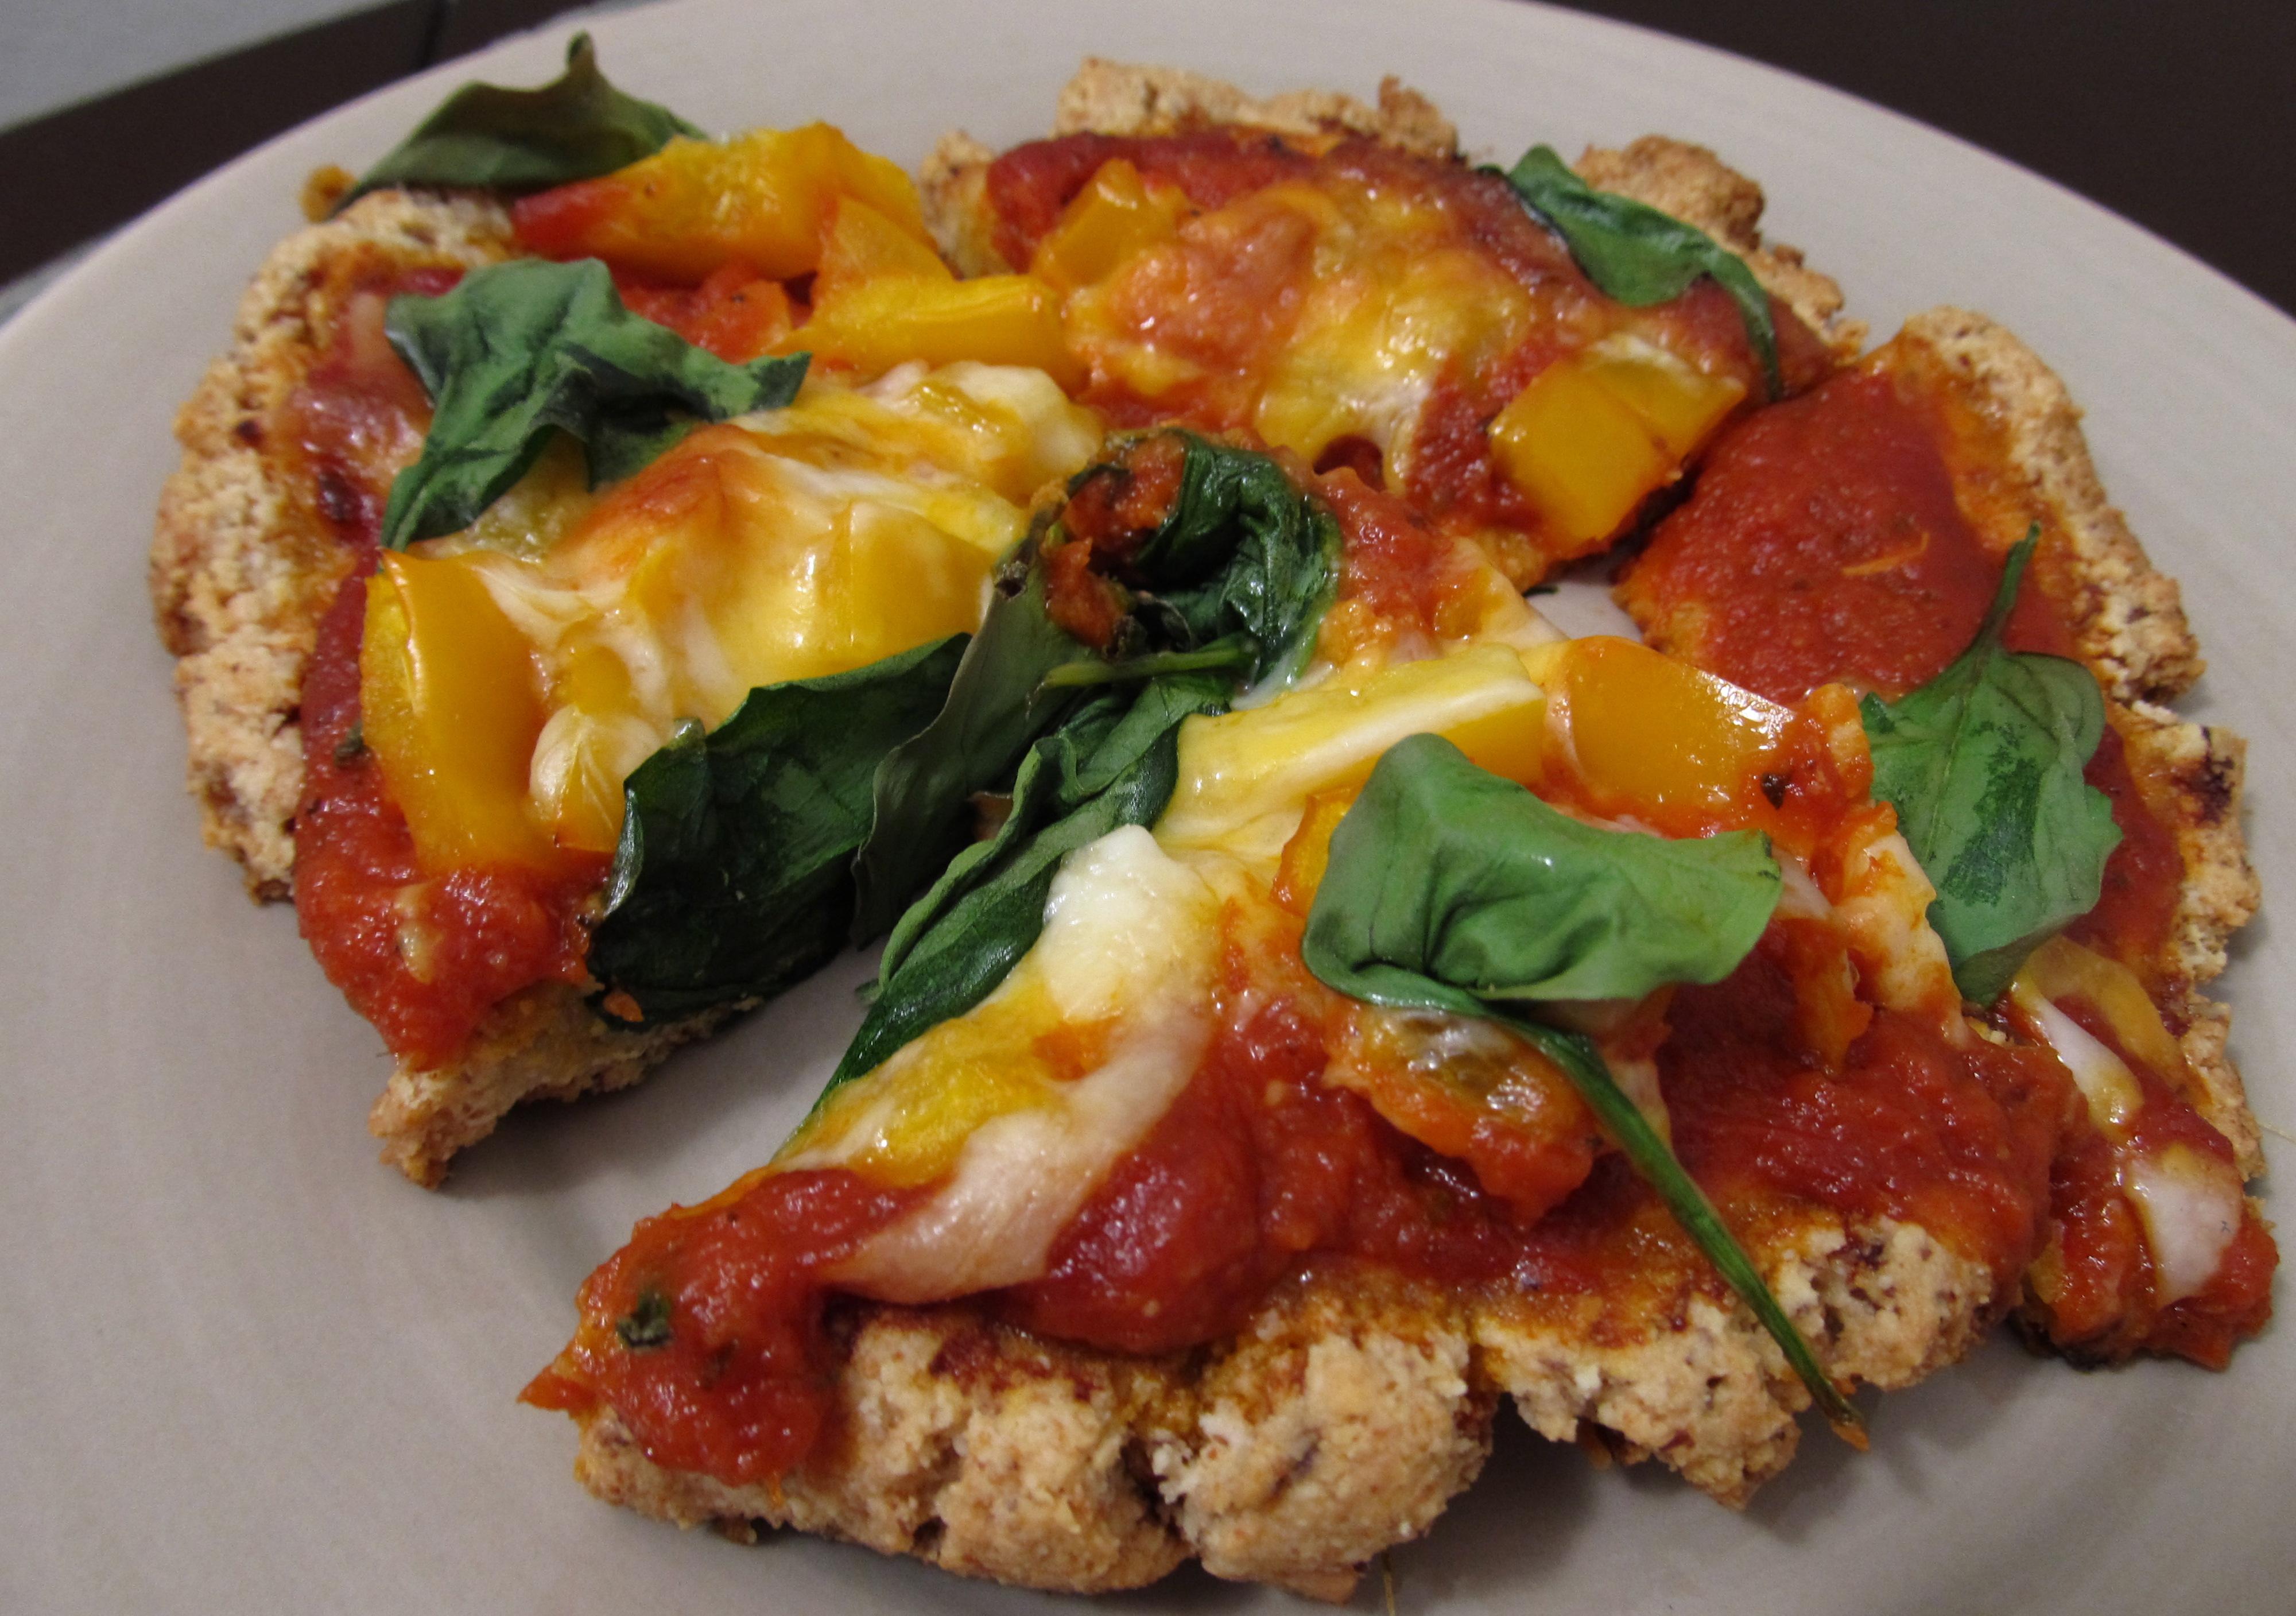 1:9-dinner-paleo-pizza